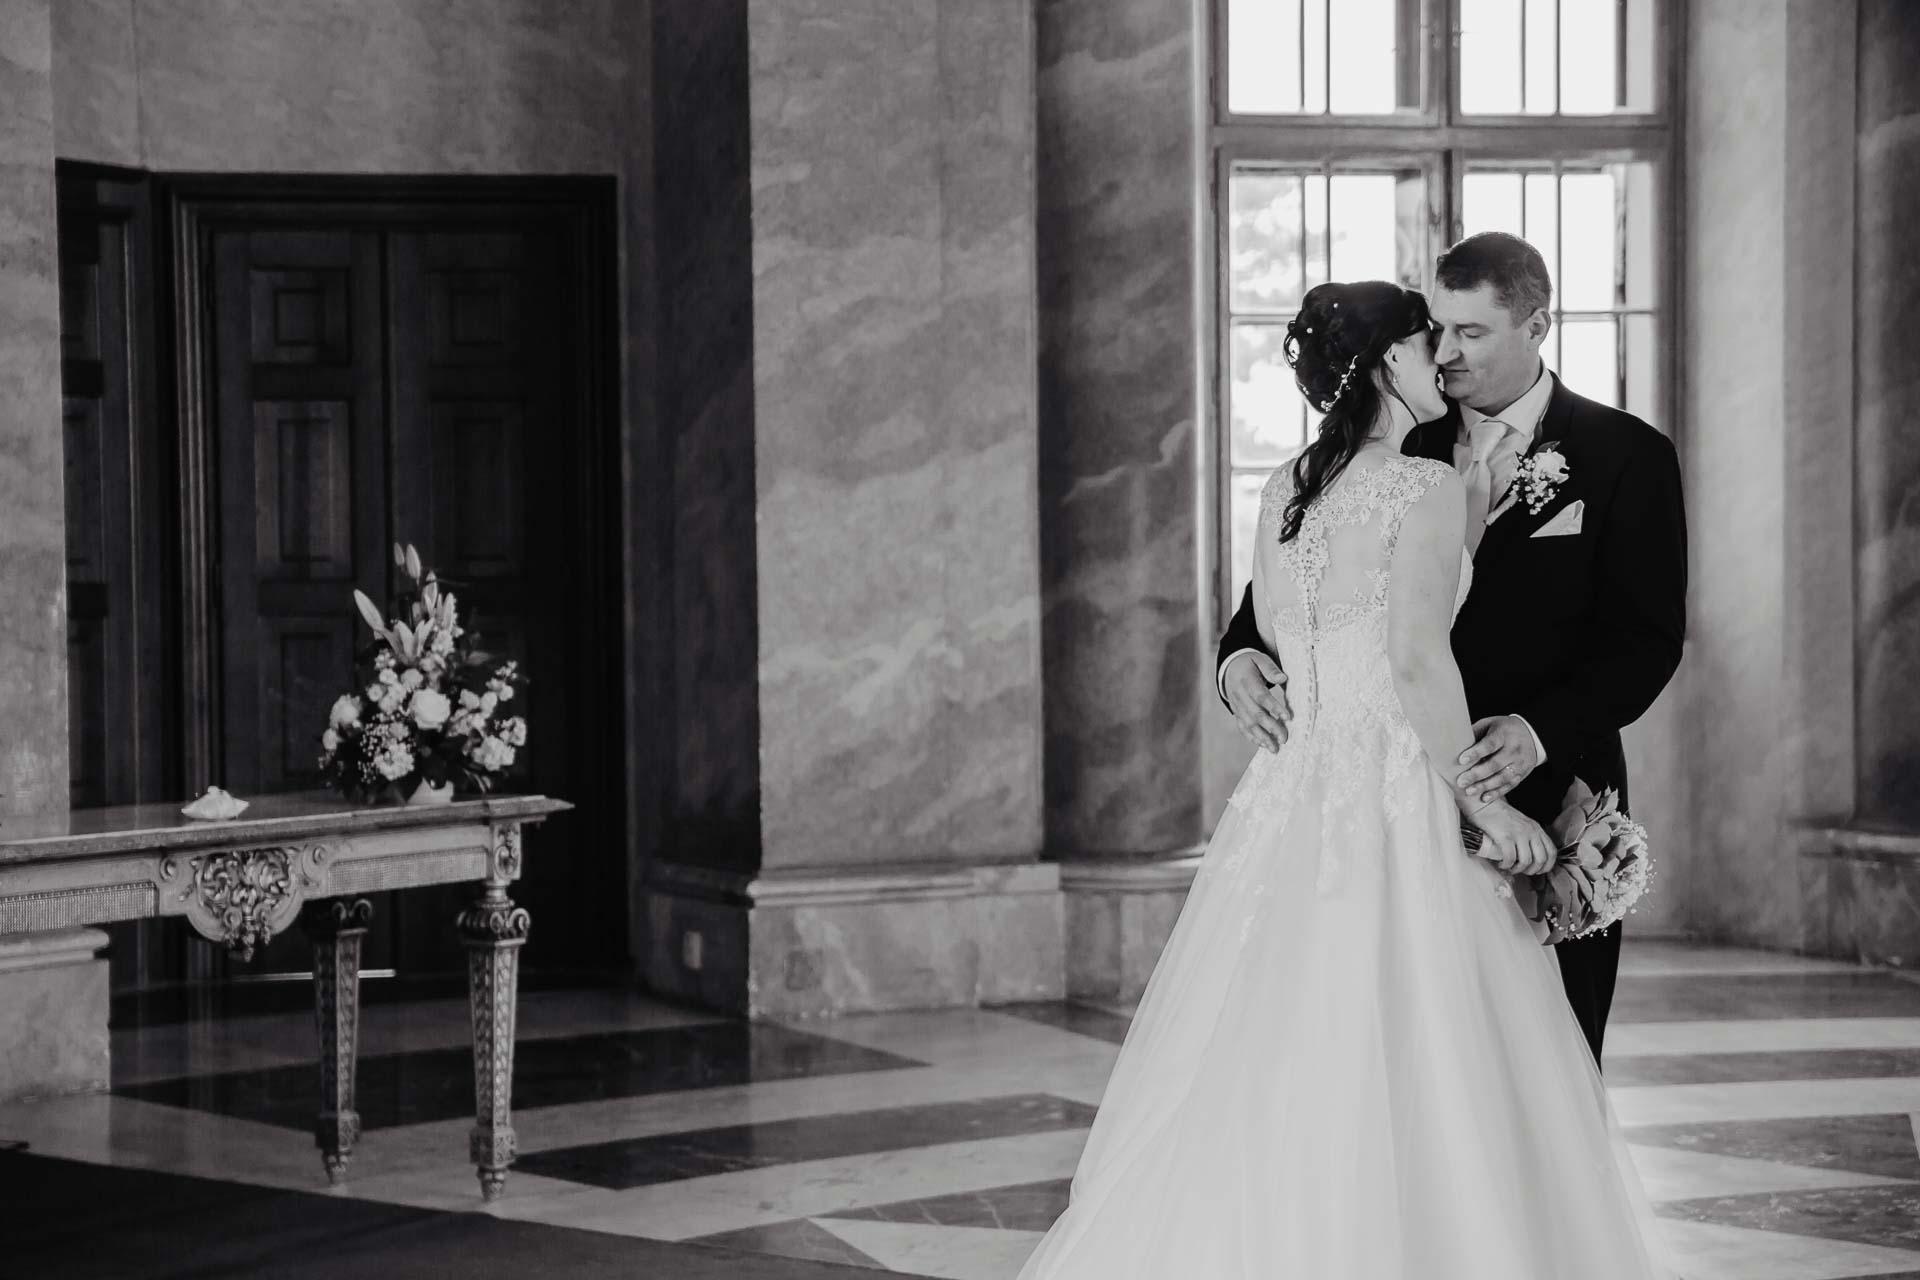 Svatební-fotograf-zámek-Karlova-Koruna-Chlumec-nad-Cidlinou-100